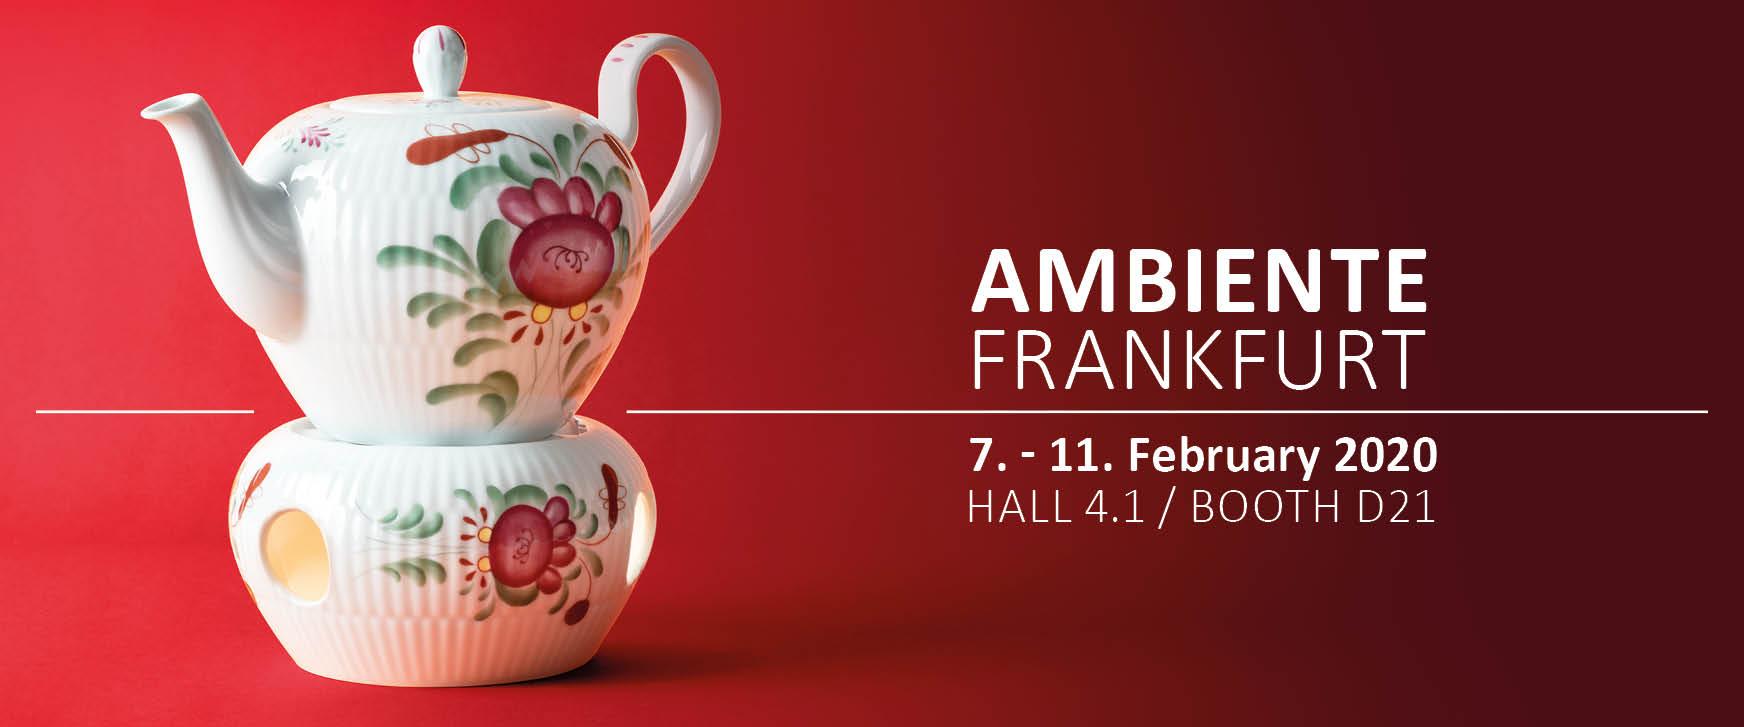 Ambiente fair in Frankfurt / Germany - Amina Ostfriesenrose